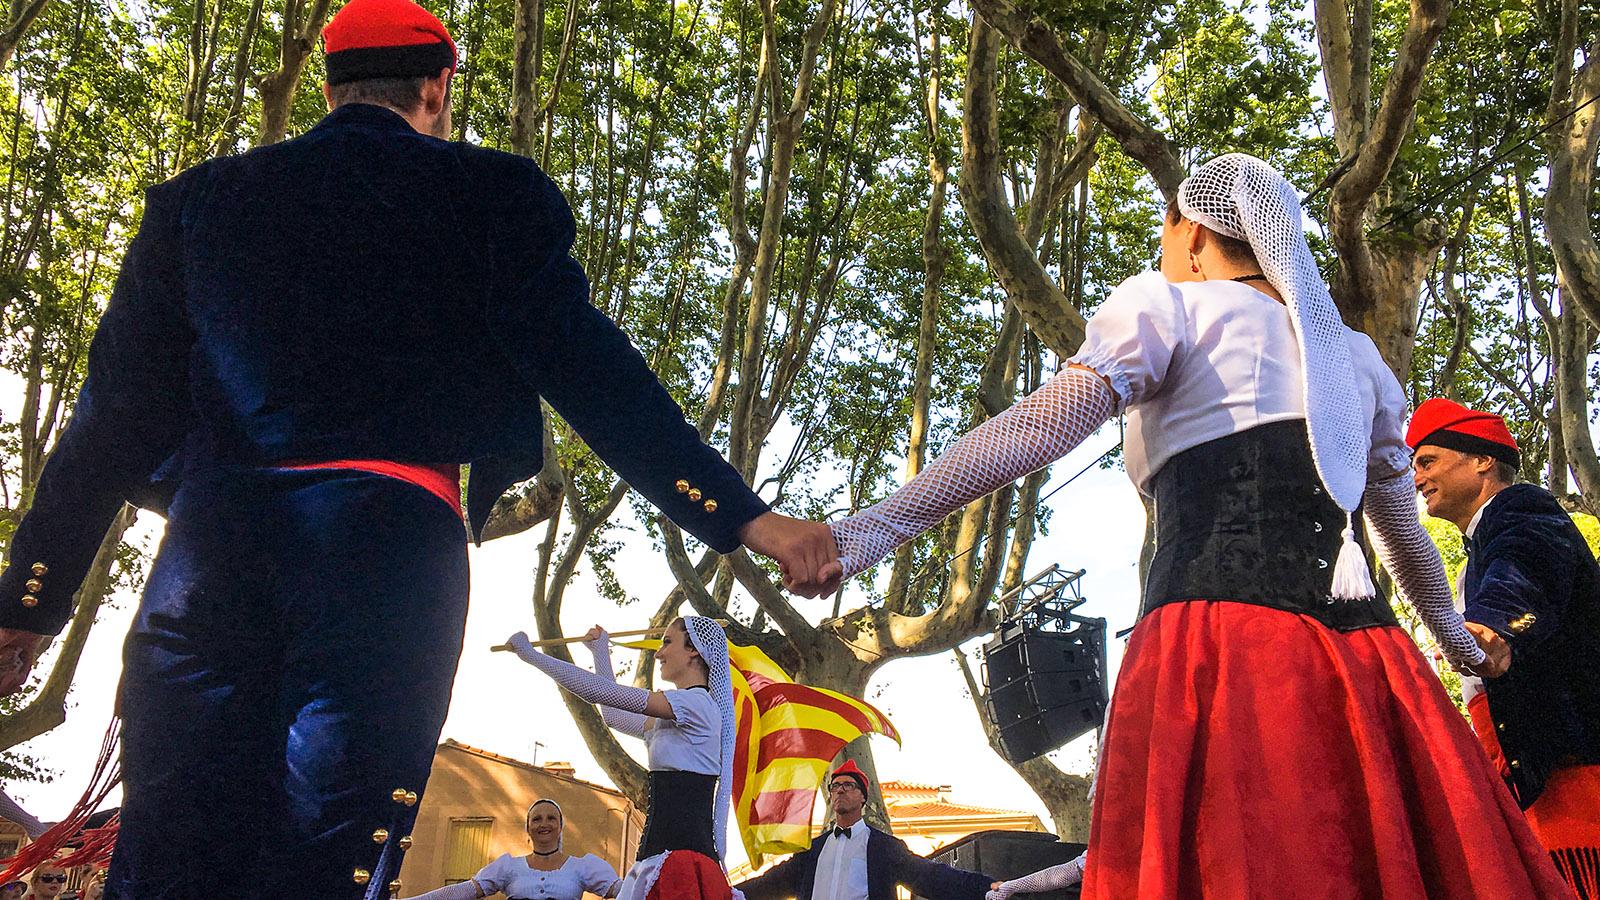 Costa Brava: Katalanen tanzen die Sardana. Foto: Hilke Maunder